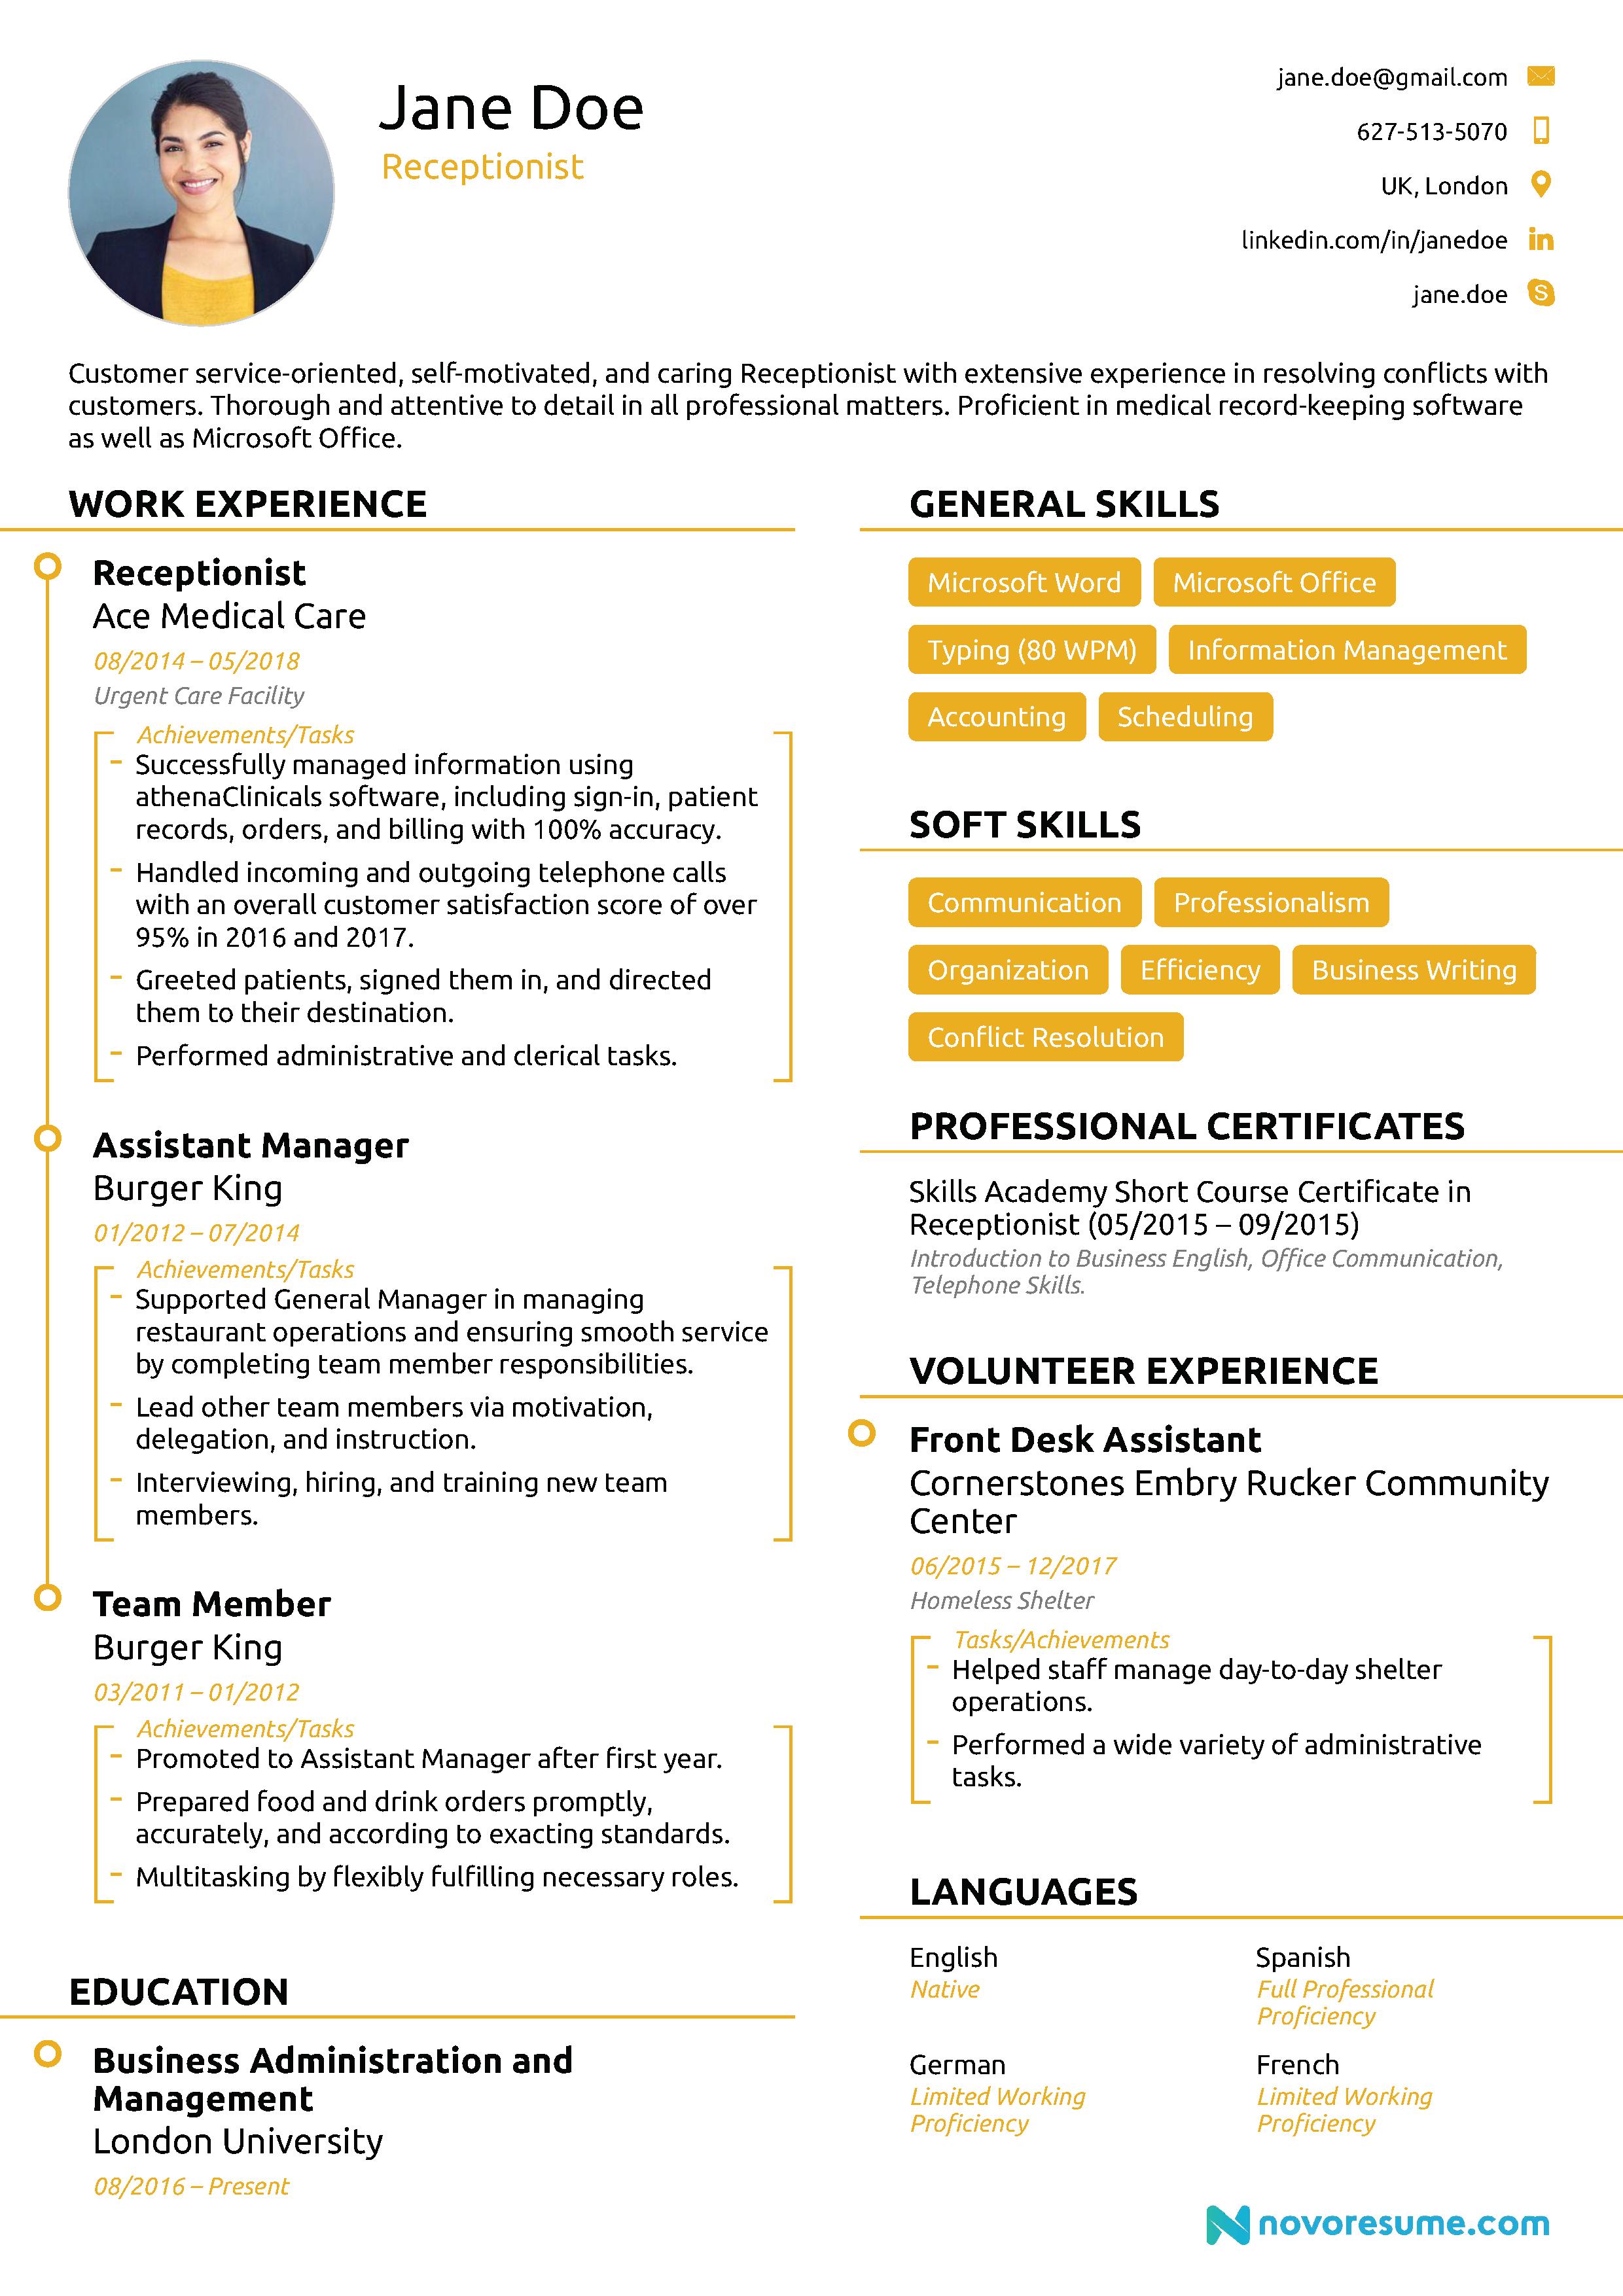 Resume For A Receptionist Receptionist Jobs Job Resume Samples Dental Receptionist